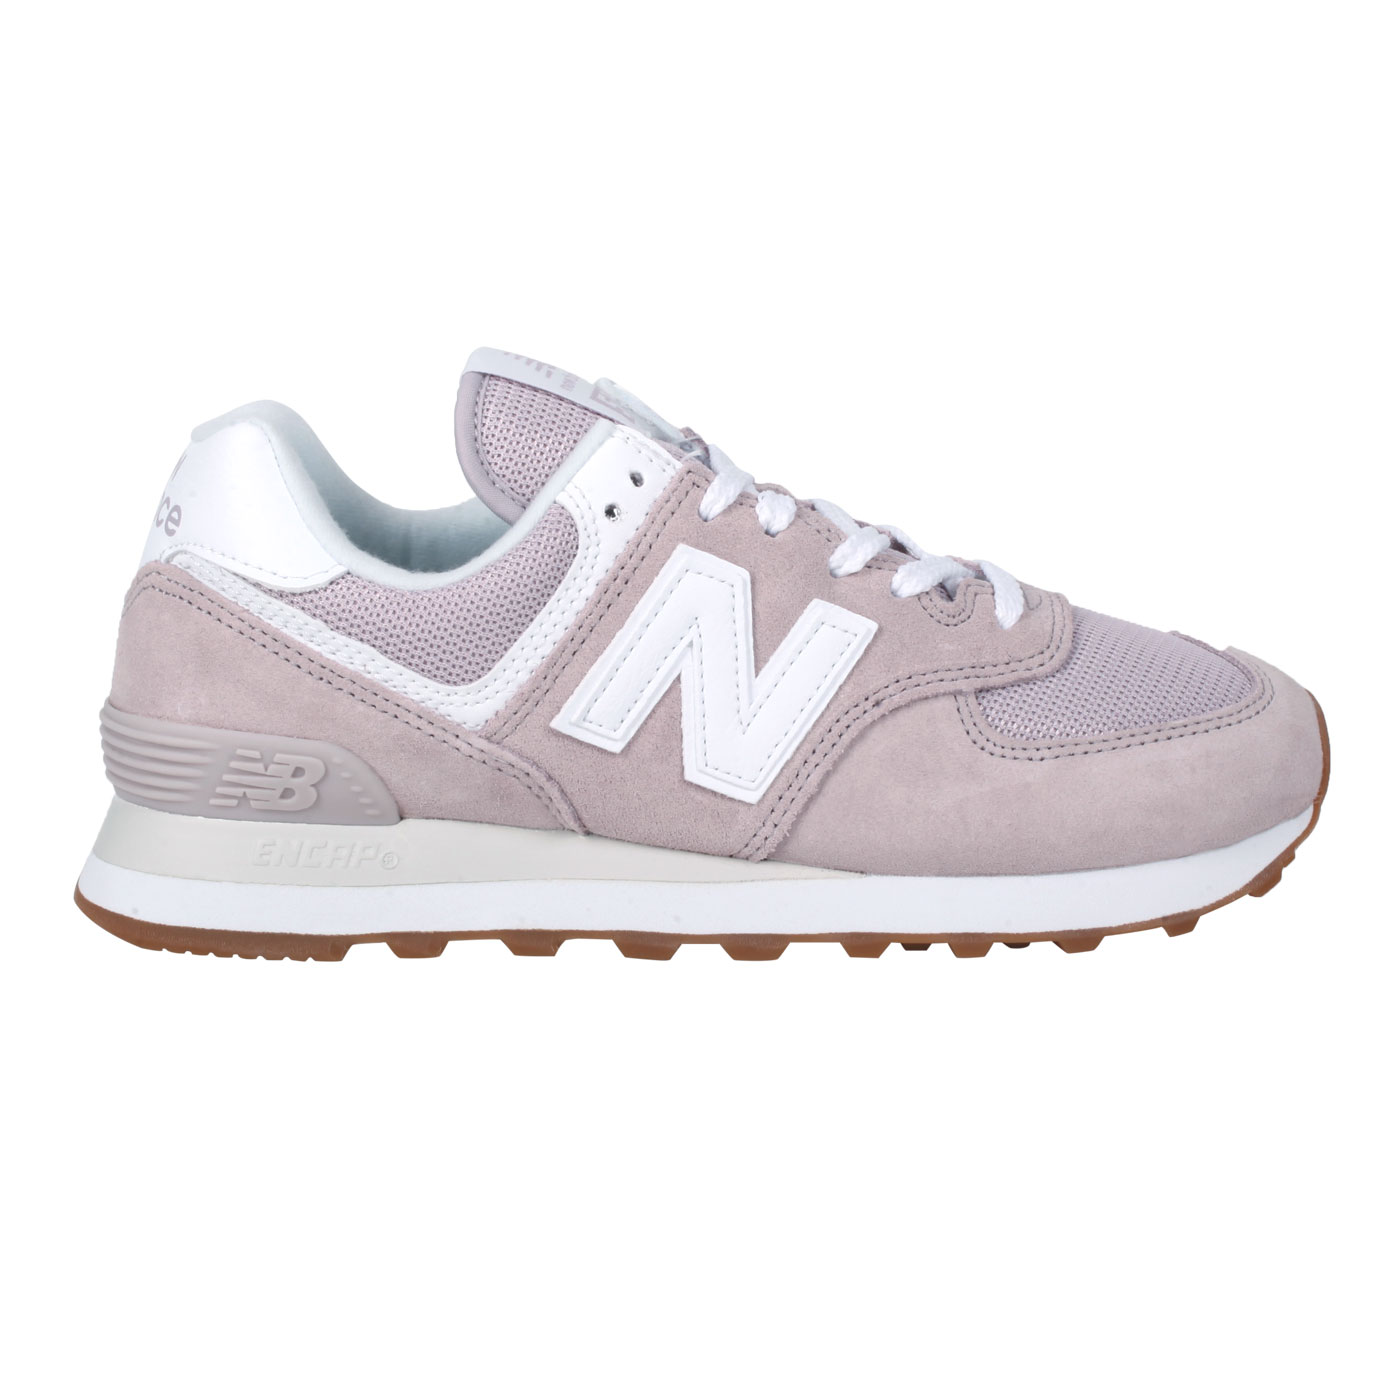 NEW BALANCE 女款休閒運動鞋 WL574PA2 - 芋紫白